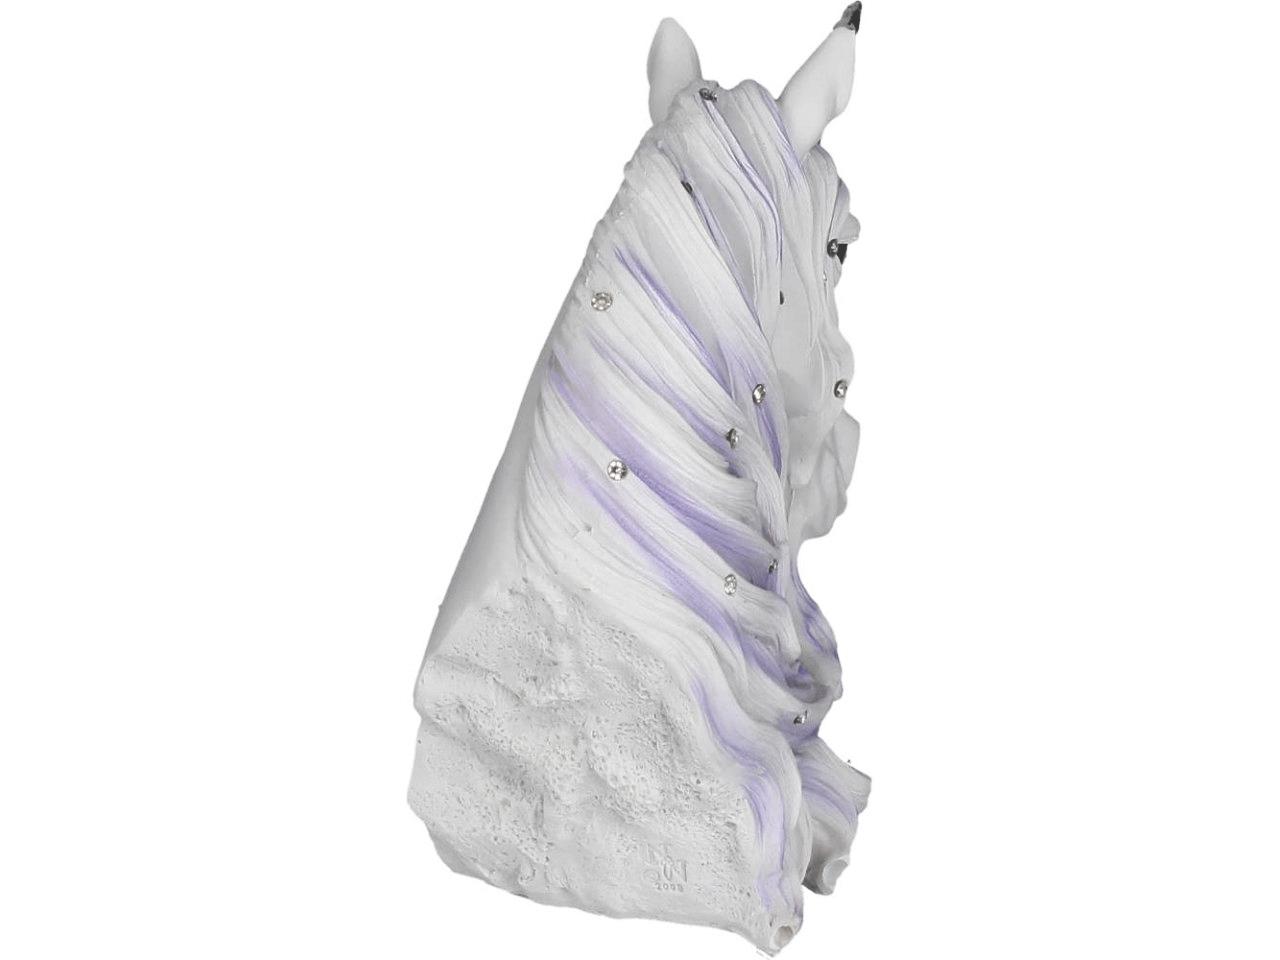 Jewelled Magnificence Unicorn Bust Figure